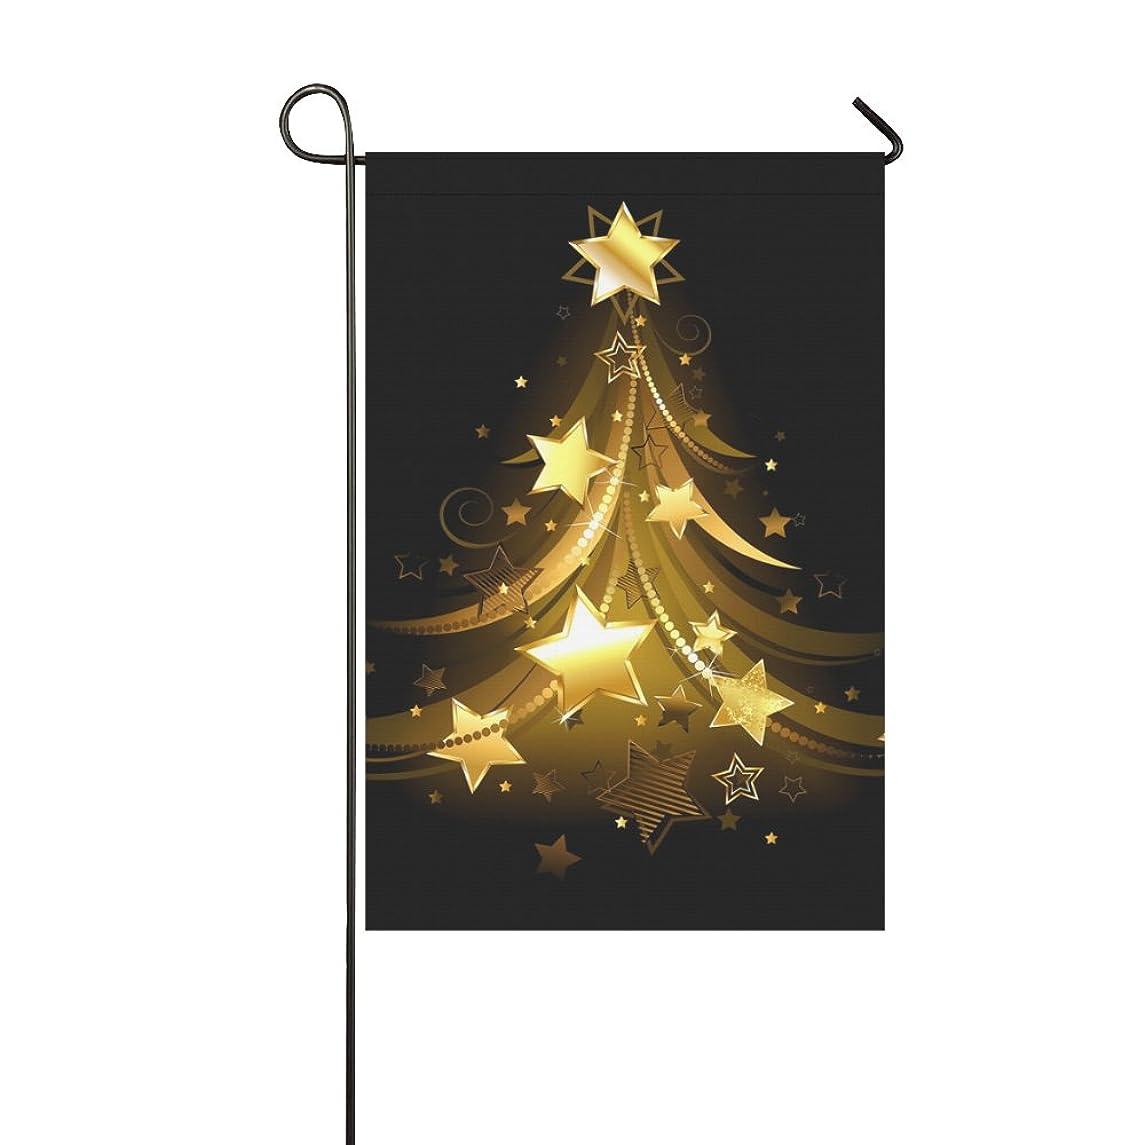 Haiqingcjhov Yard and Home Outdoor Decor - Merry Christmas - Shining Christmas Tree Garden Decor Flag, 12